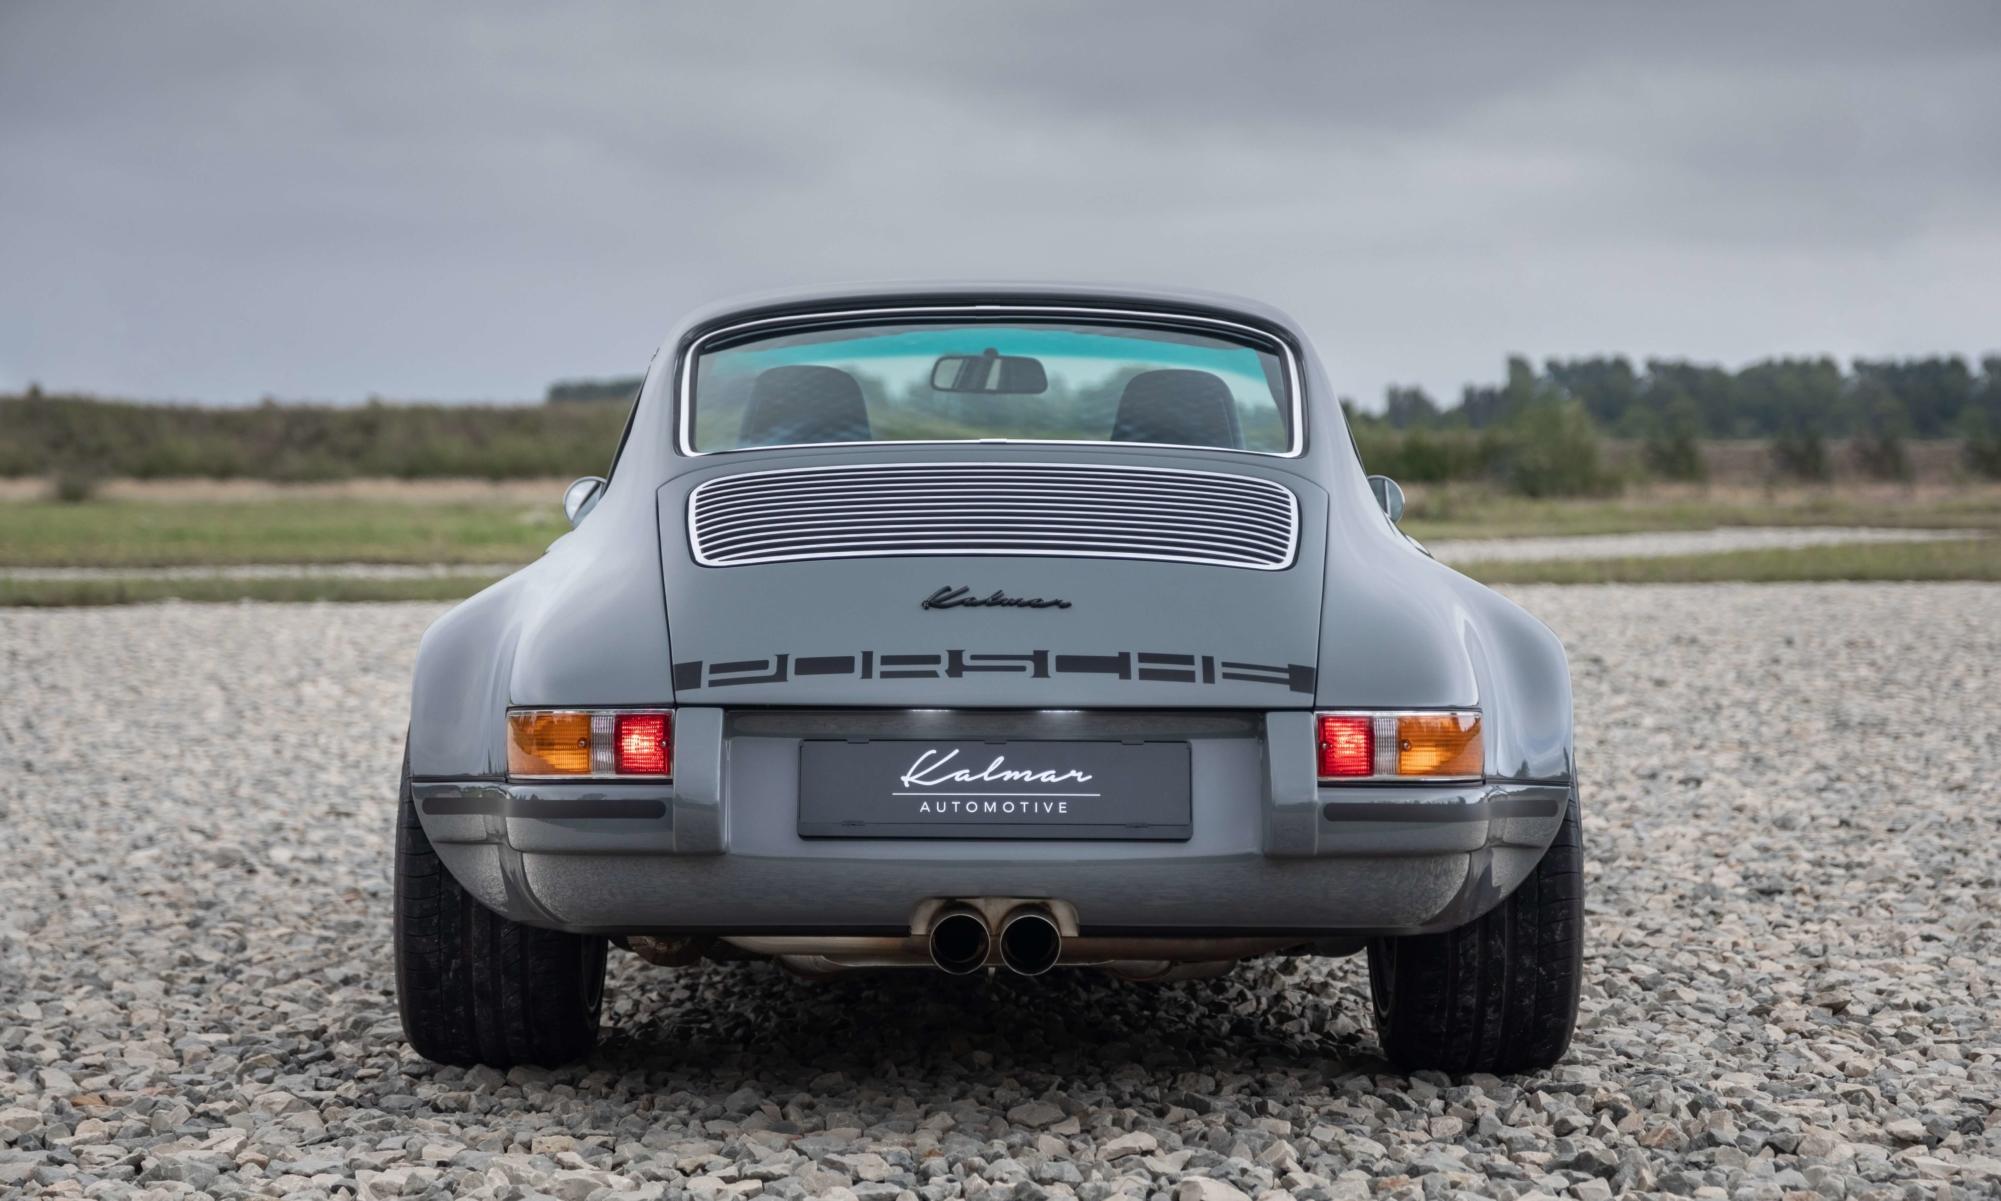 Kalmar Automotive Porsche 797 rear